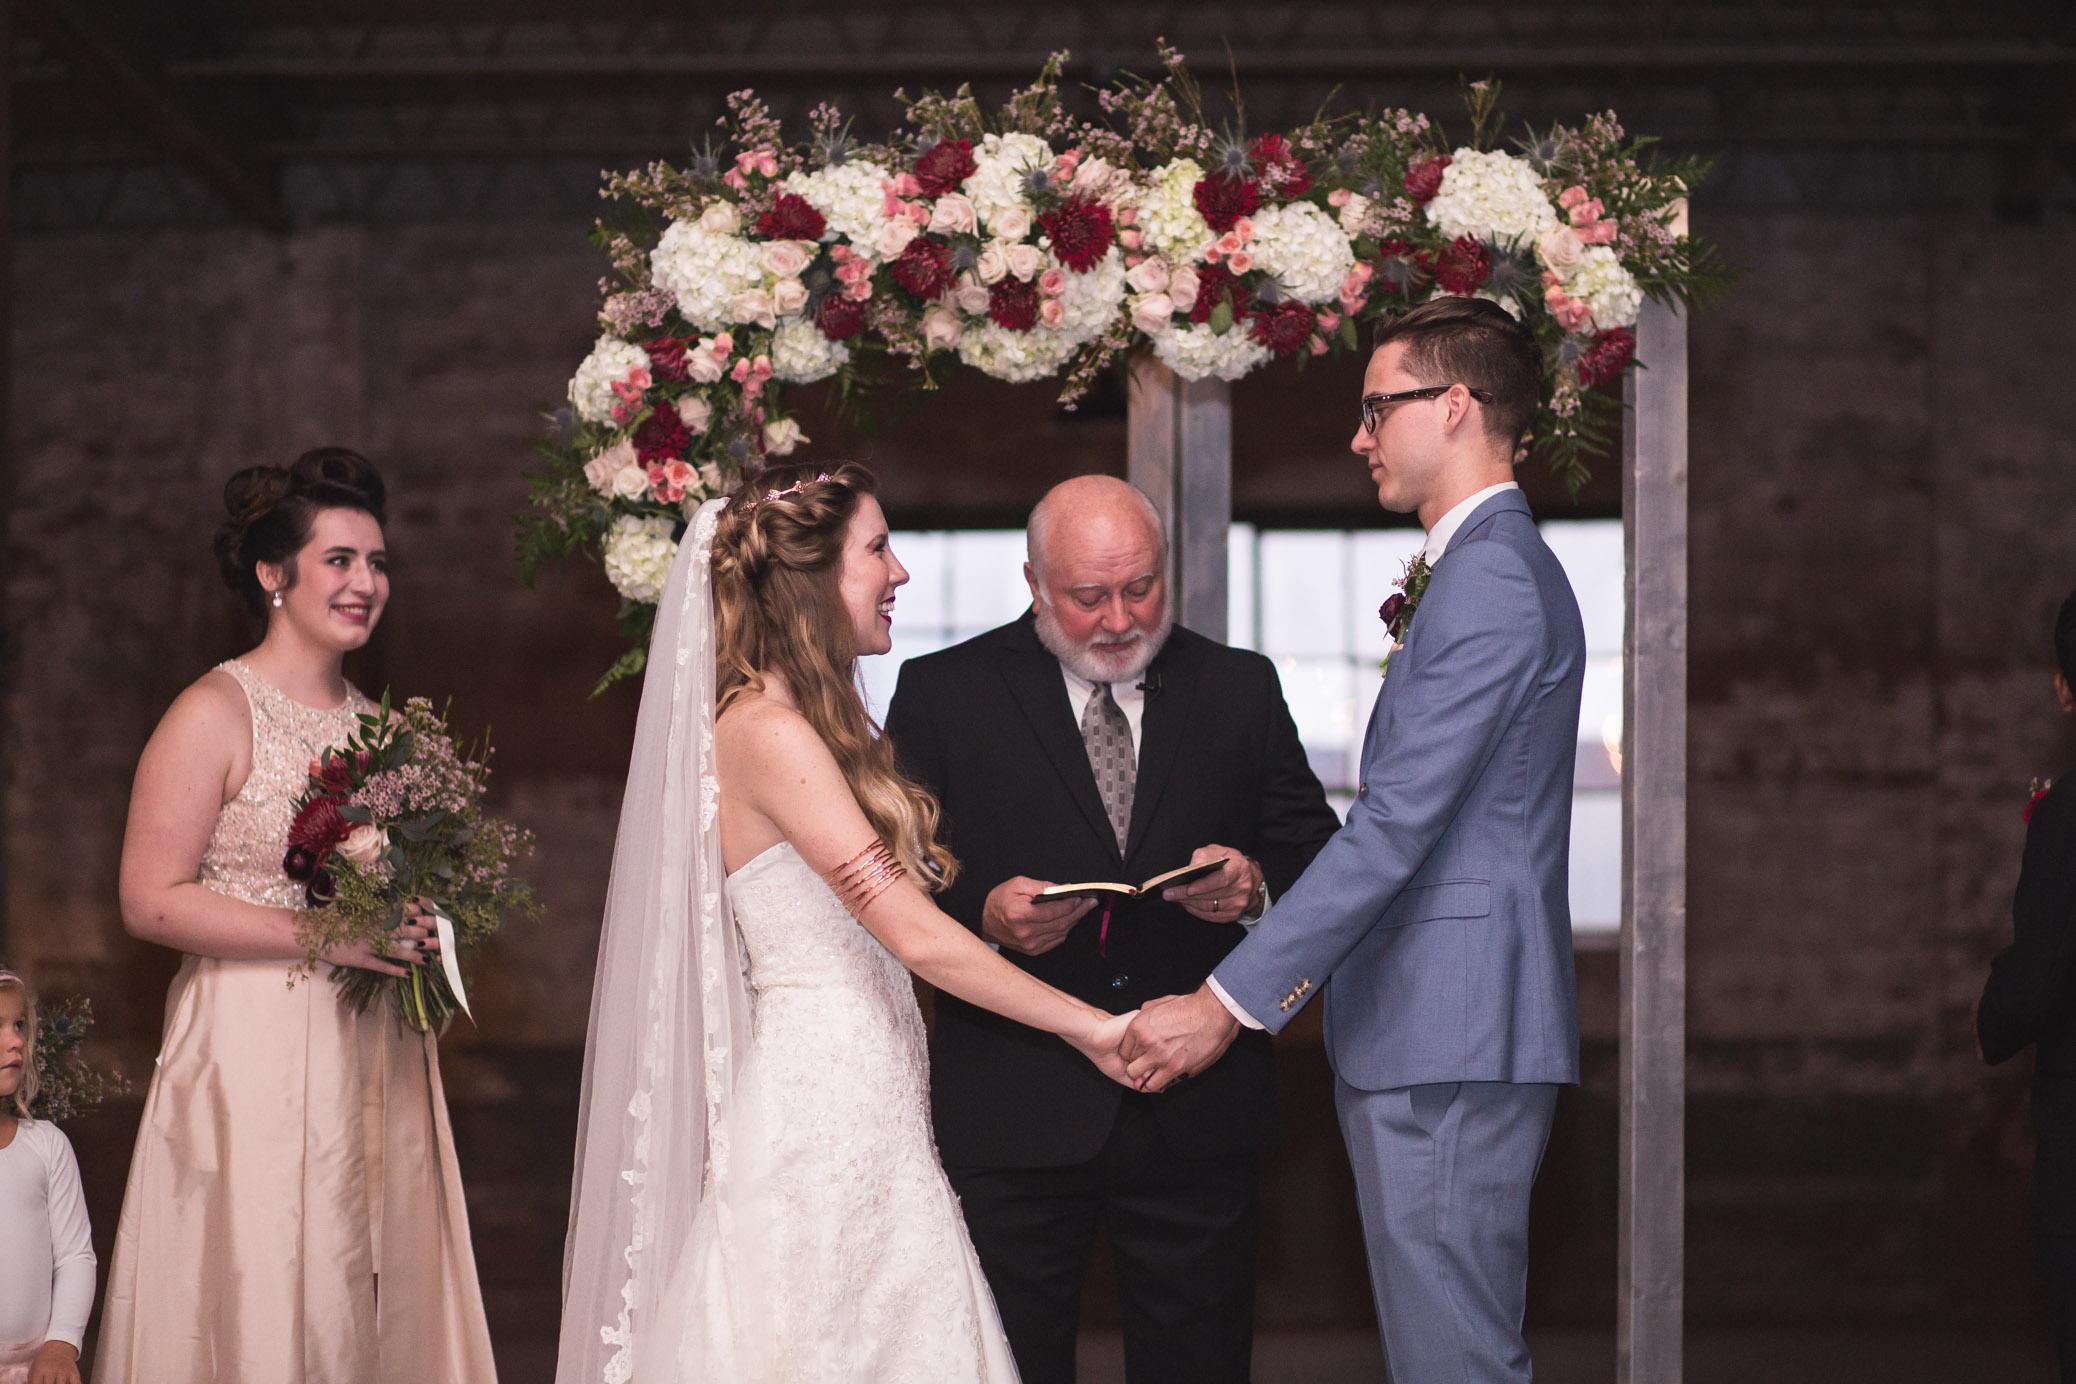 Adam-Szrmack-The-Glass-Factory-Wedding-111.jpg